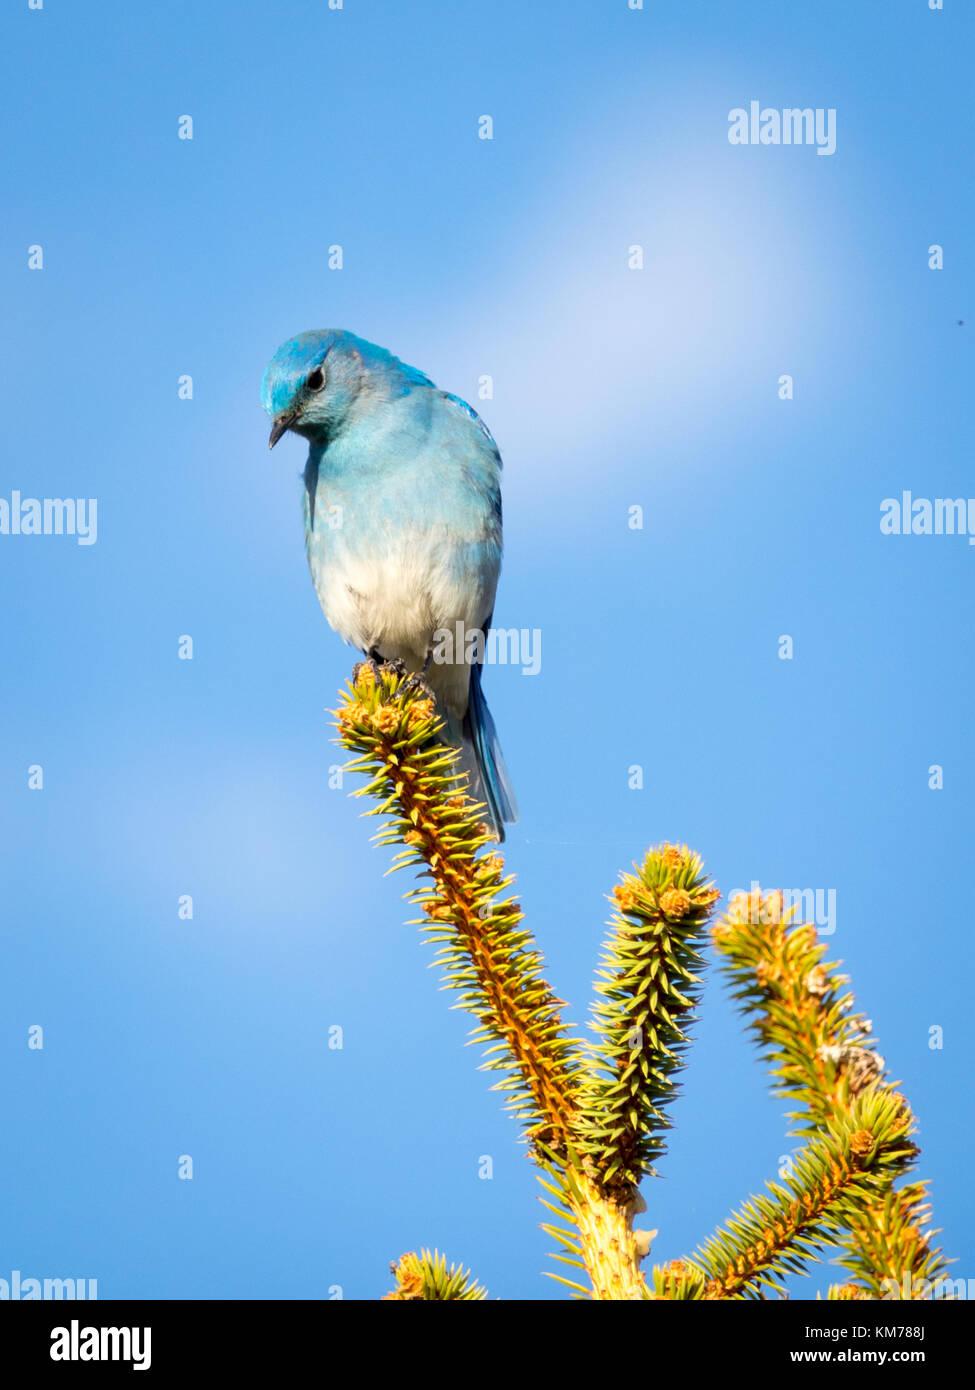 A male Mountain bluebird (Sialia currucoides), in breeding plumage, perched near Tofield, Alberta, Canada. - Stock Image